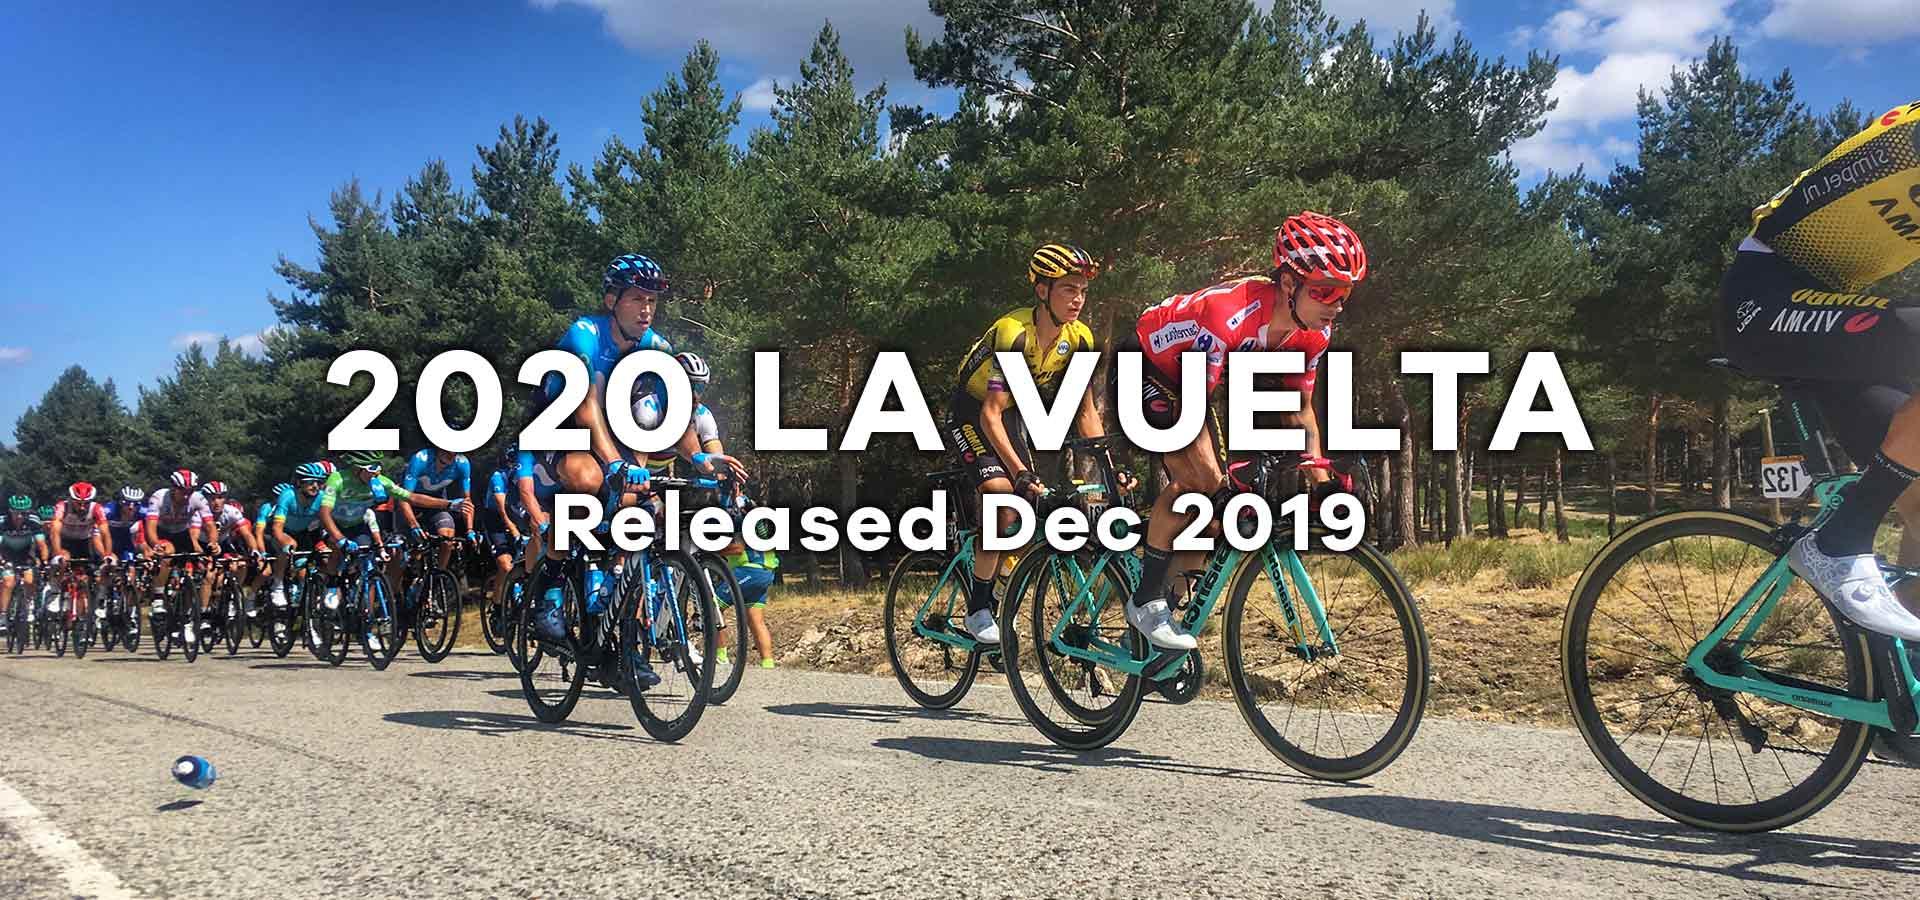 La Vuelta a España, La Vuelta, Vuelta, Tour of Spain